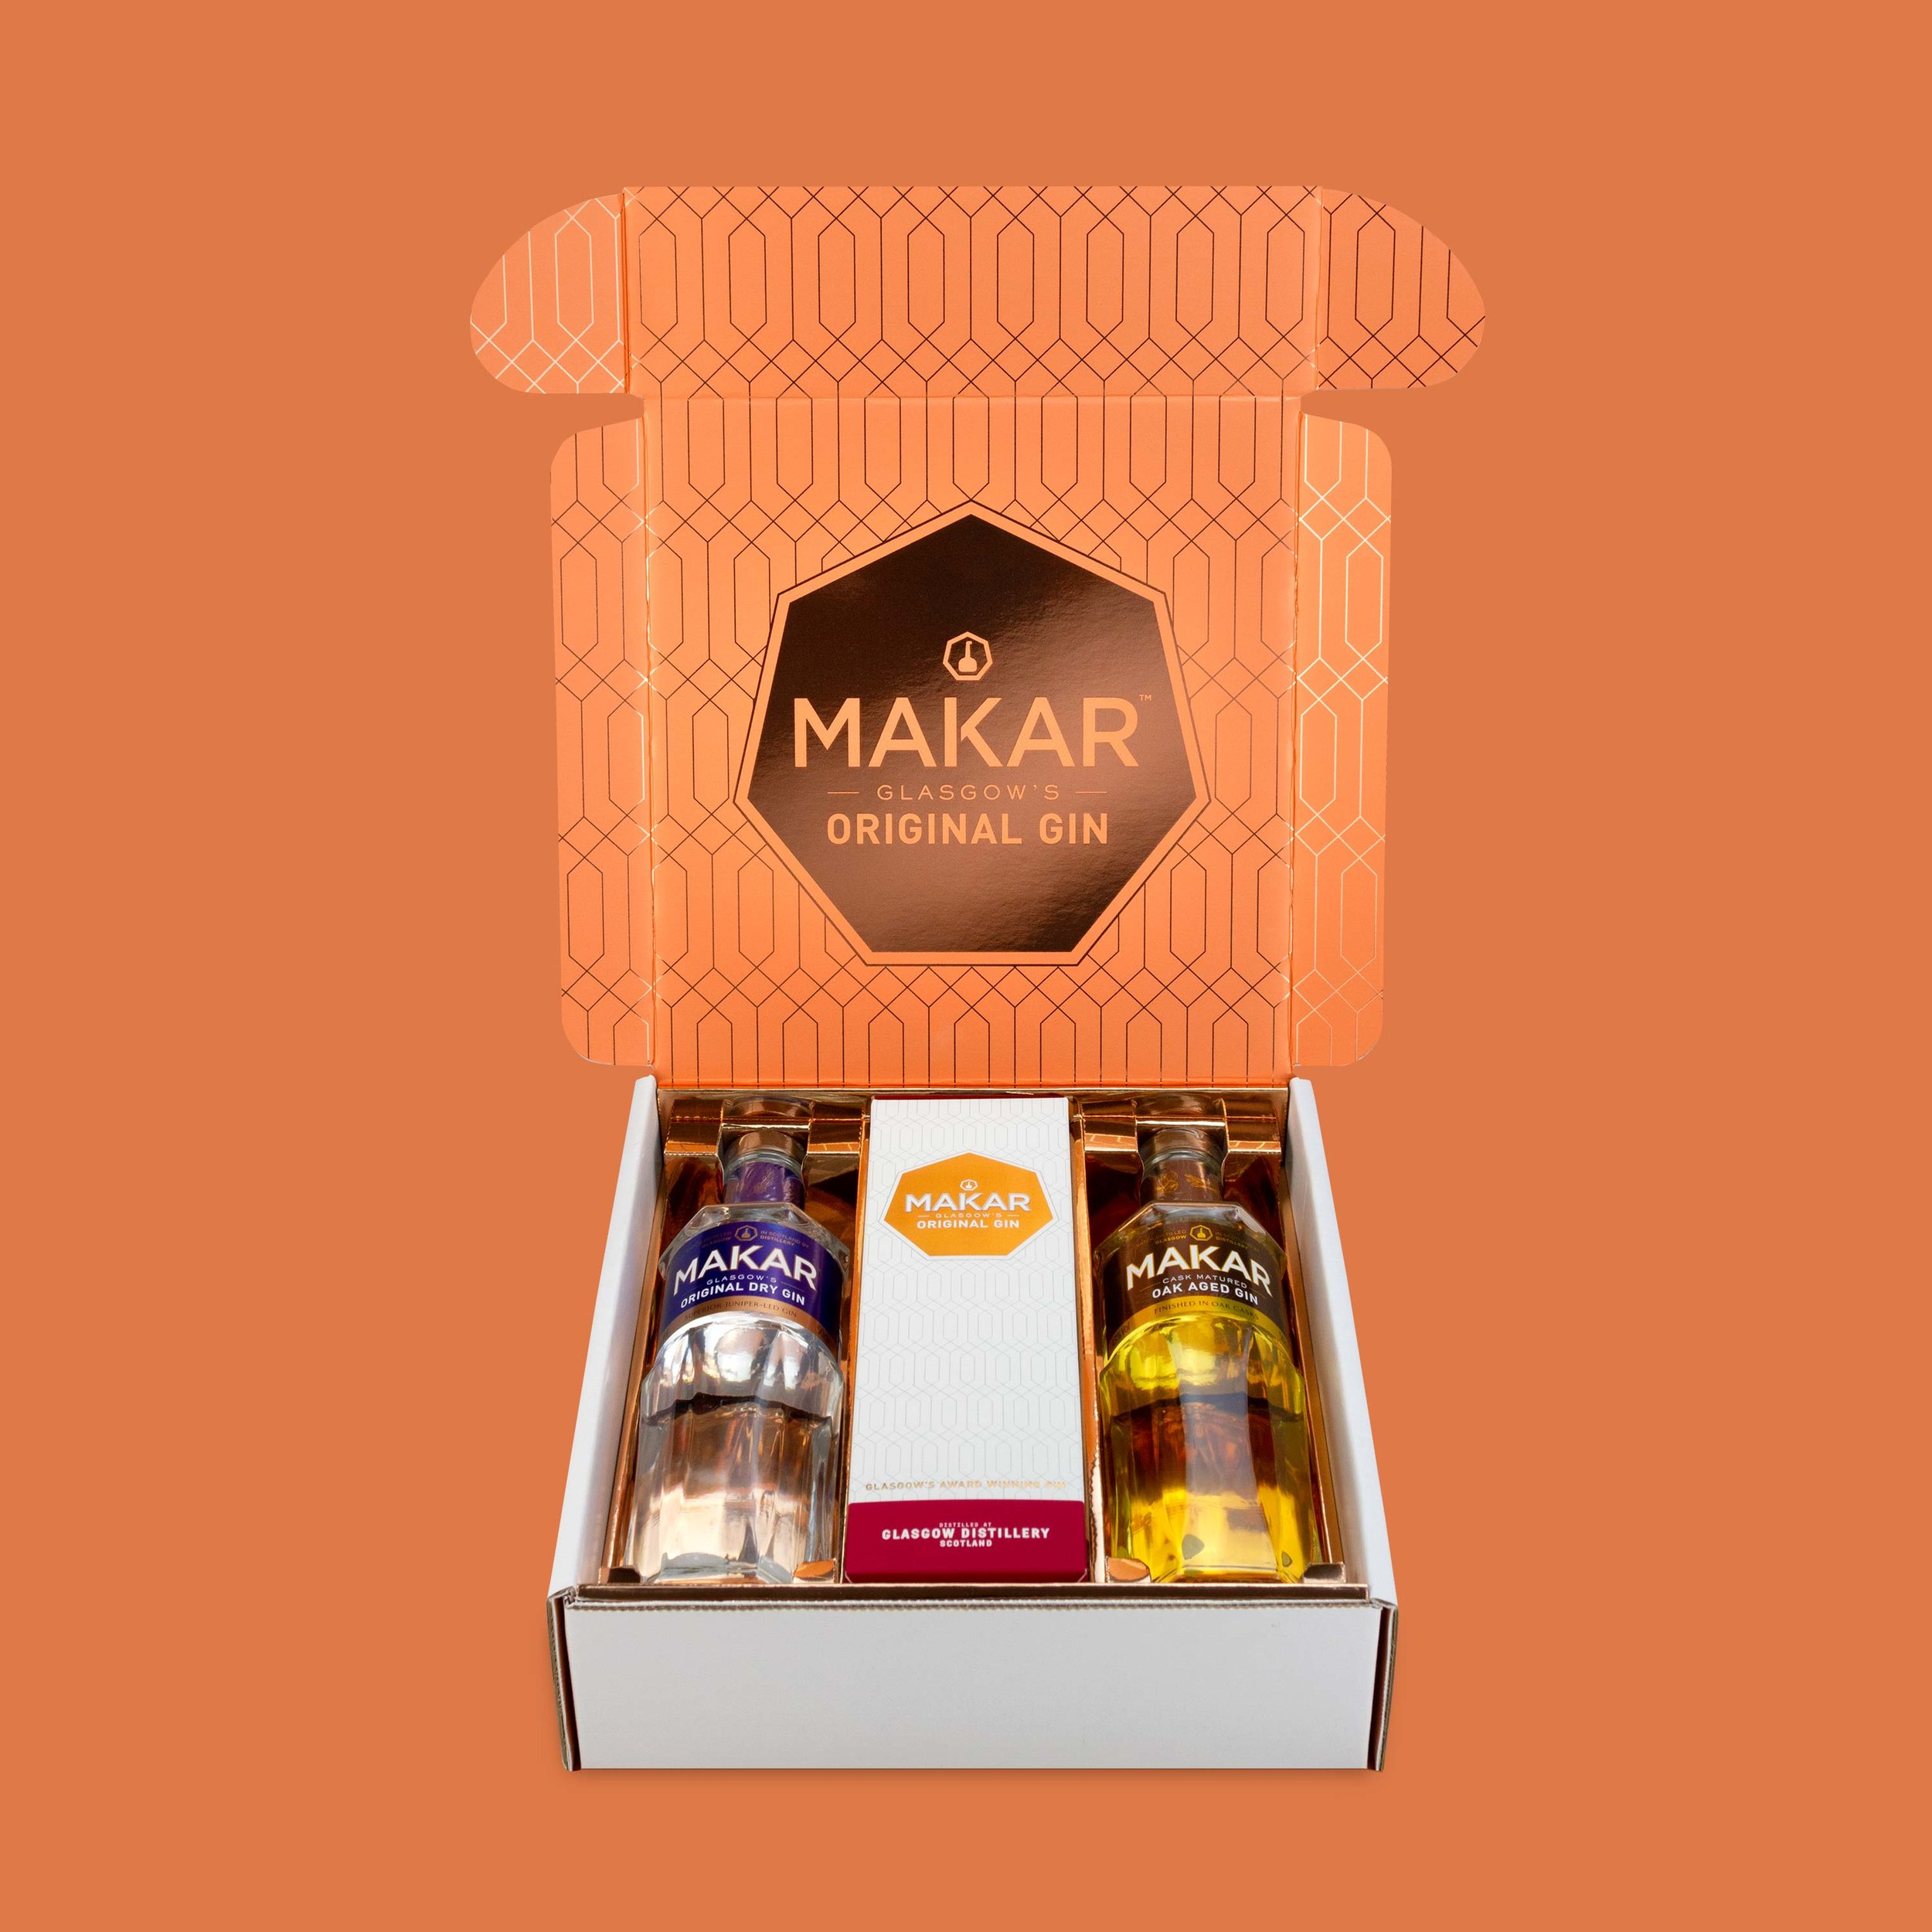 Makar-Gin-Wow-Box-Packaging-Design-Prototype-05.jpg